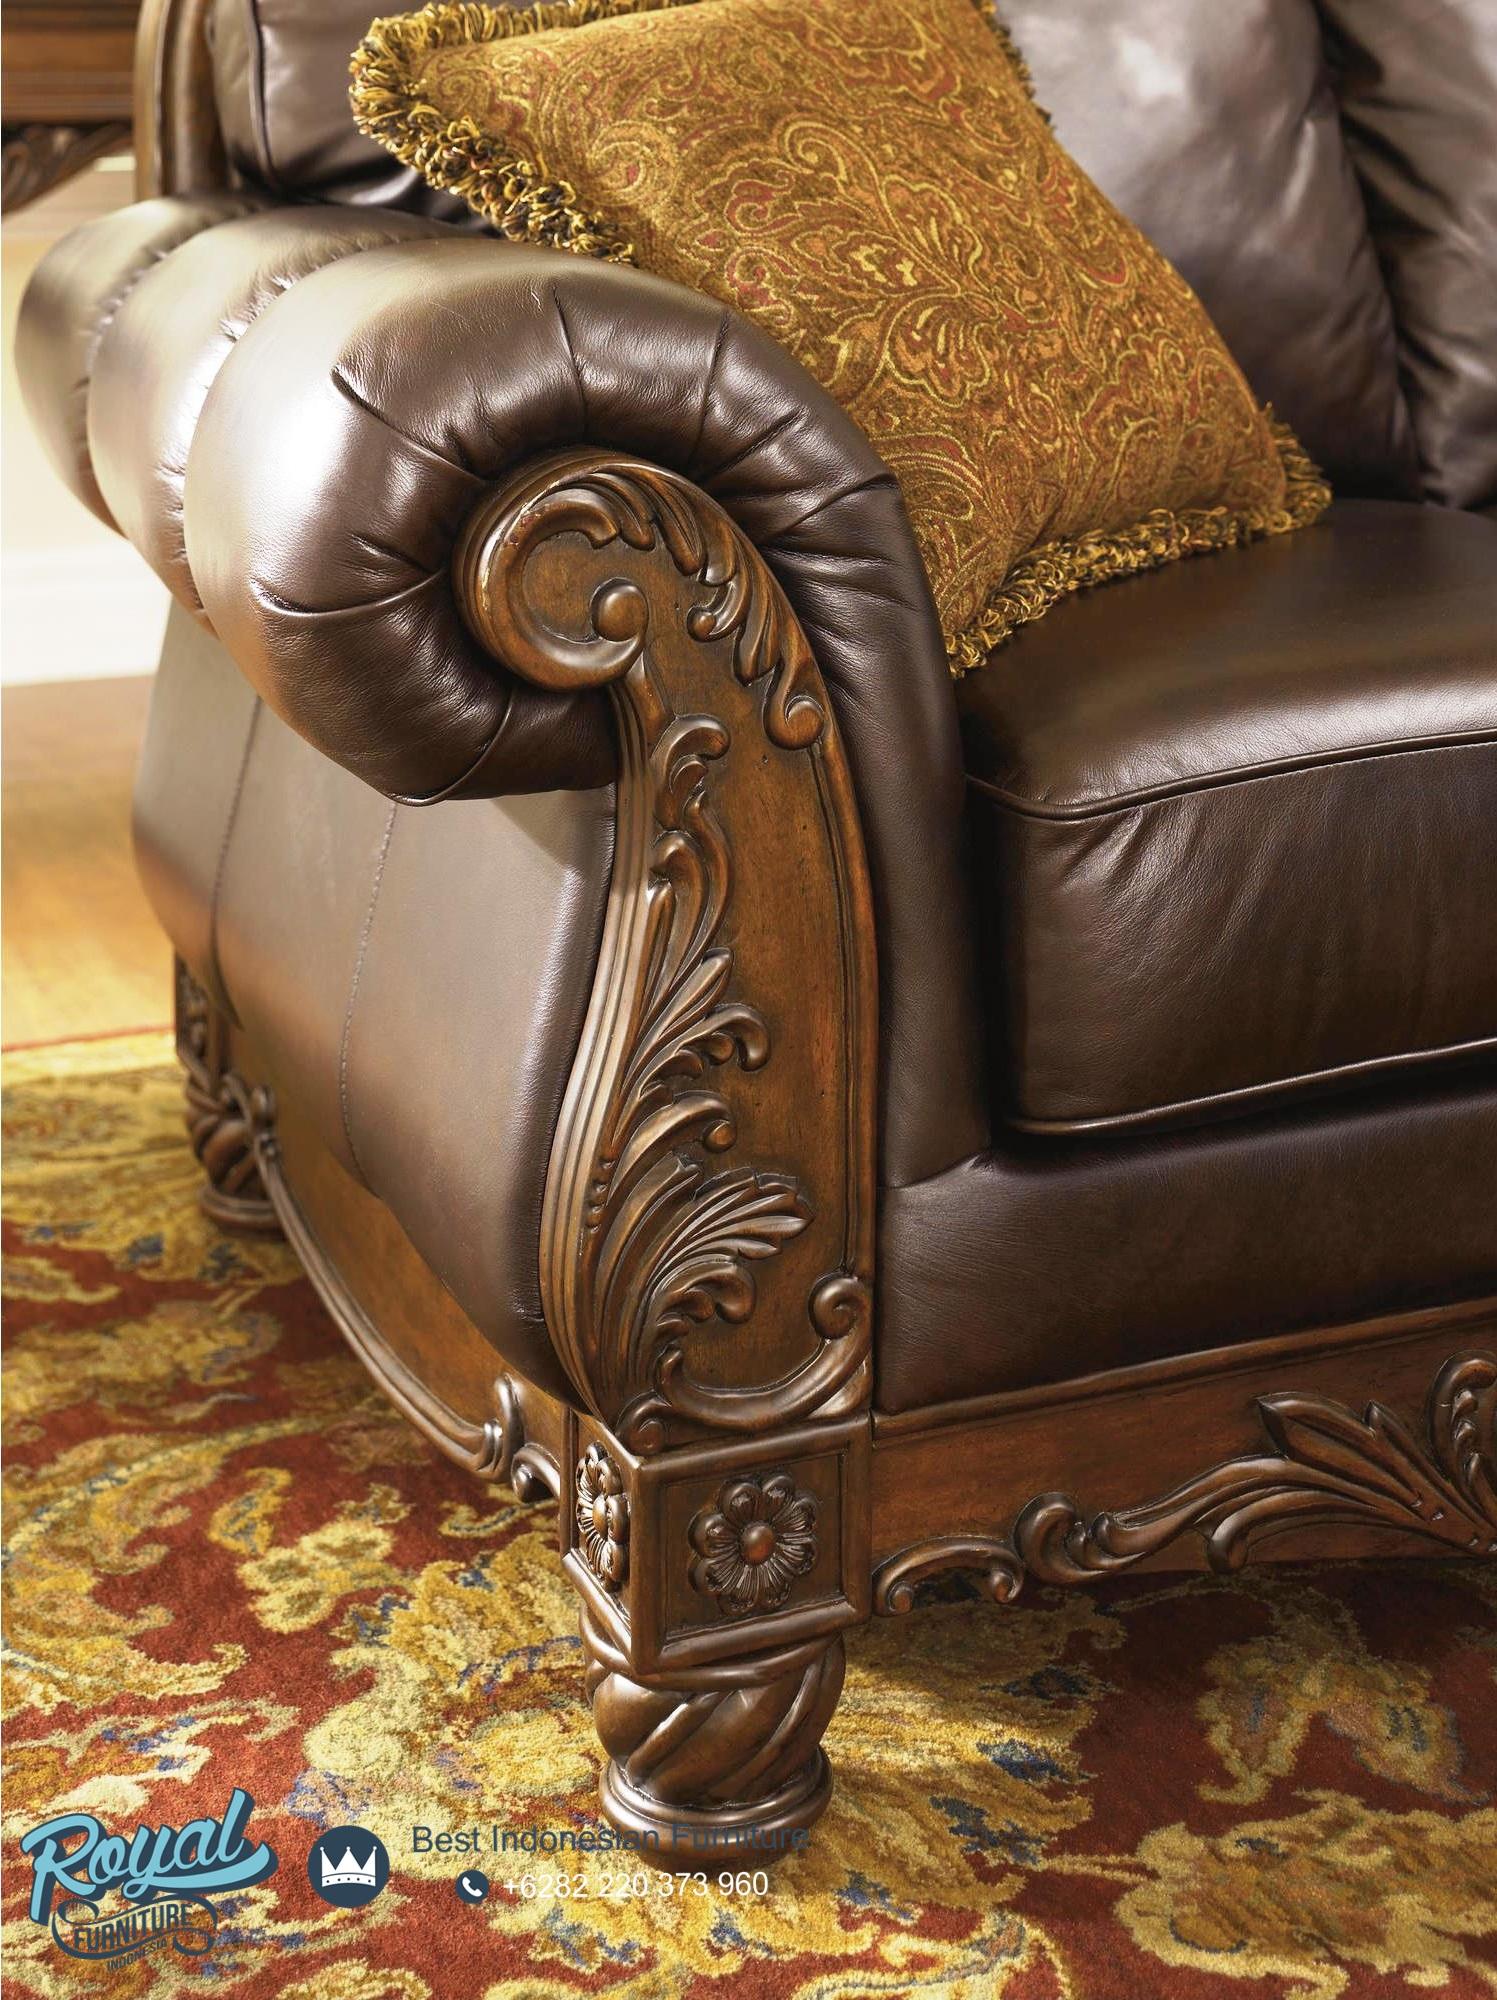 Set Sofa Tamu Klasik Ukiran Jepara Kayu Jati Antique, sofa tamu mewah jepara, sofa tamu mewah kayu jati, sofa tamu mewah terbaru, sofa tamu mewah kayu jati, jual sofa tamu mewah asli jepara, sofa ruang tamu mewah, sofa ruang tamu mewah modern, kursi sofa tamu mewah, harga sofa tamu mewah murah, sofa tamu minimalis mewah, sofa mewah, kursi tamu mewah modern, kursi tamu mewah minimalis, sofa mewah modern, kursi mewah ruang tamu, kursi tamu mewah kualitas terbaik, sofa klasik mewah terbaru, mebel jepara, furniture jepara, royal furniture